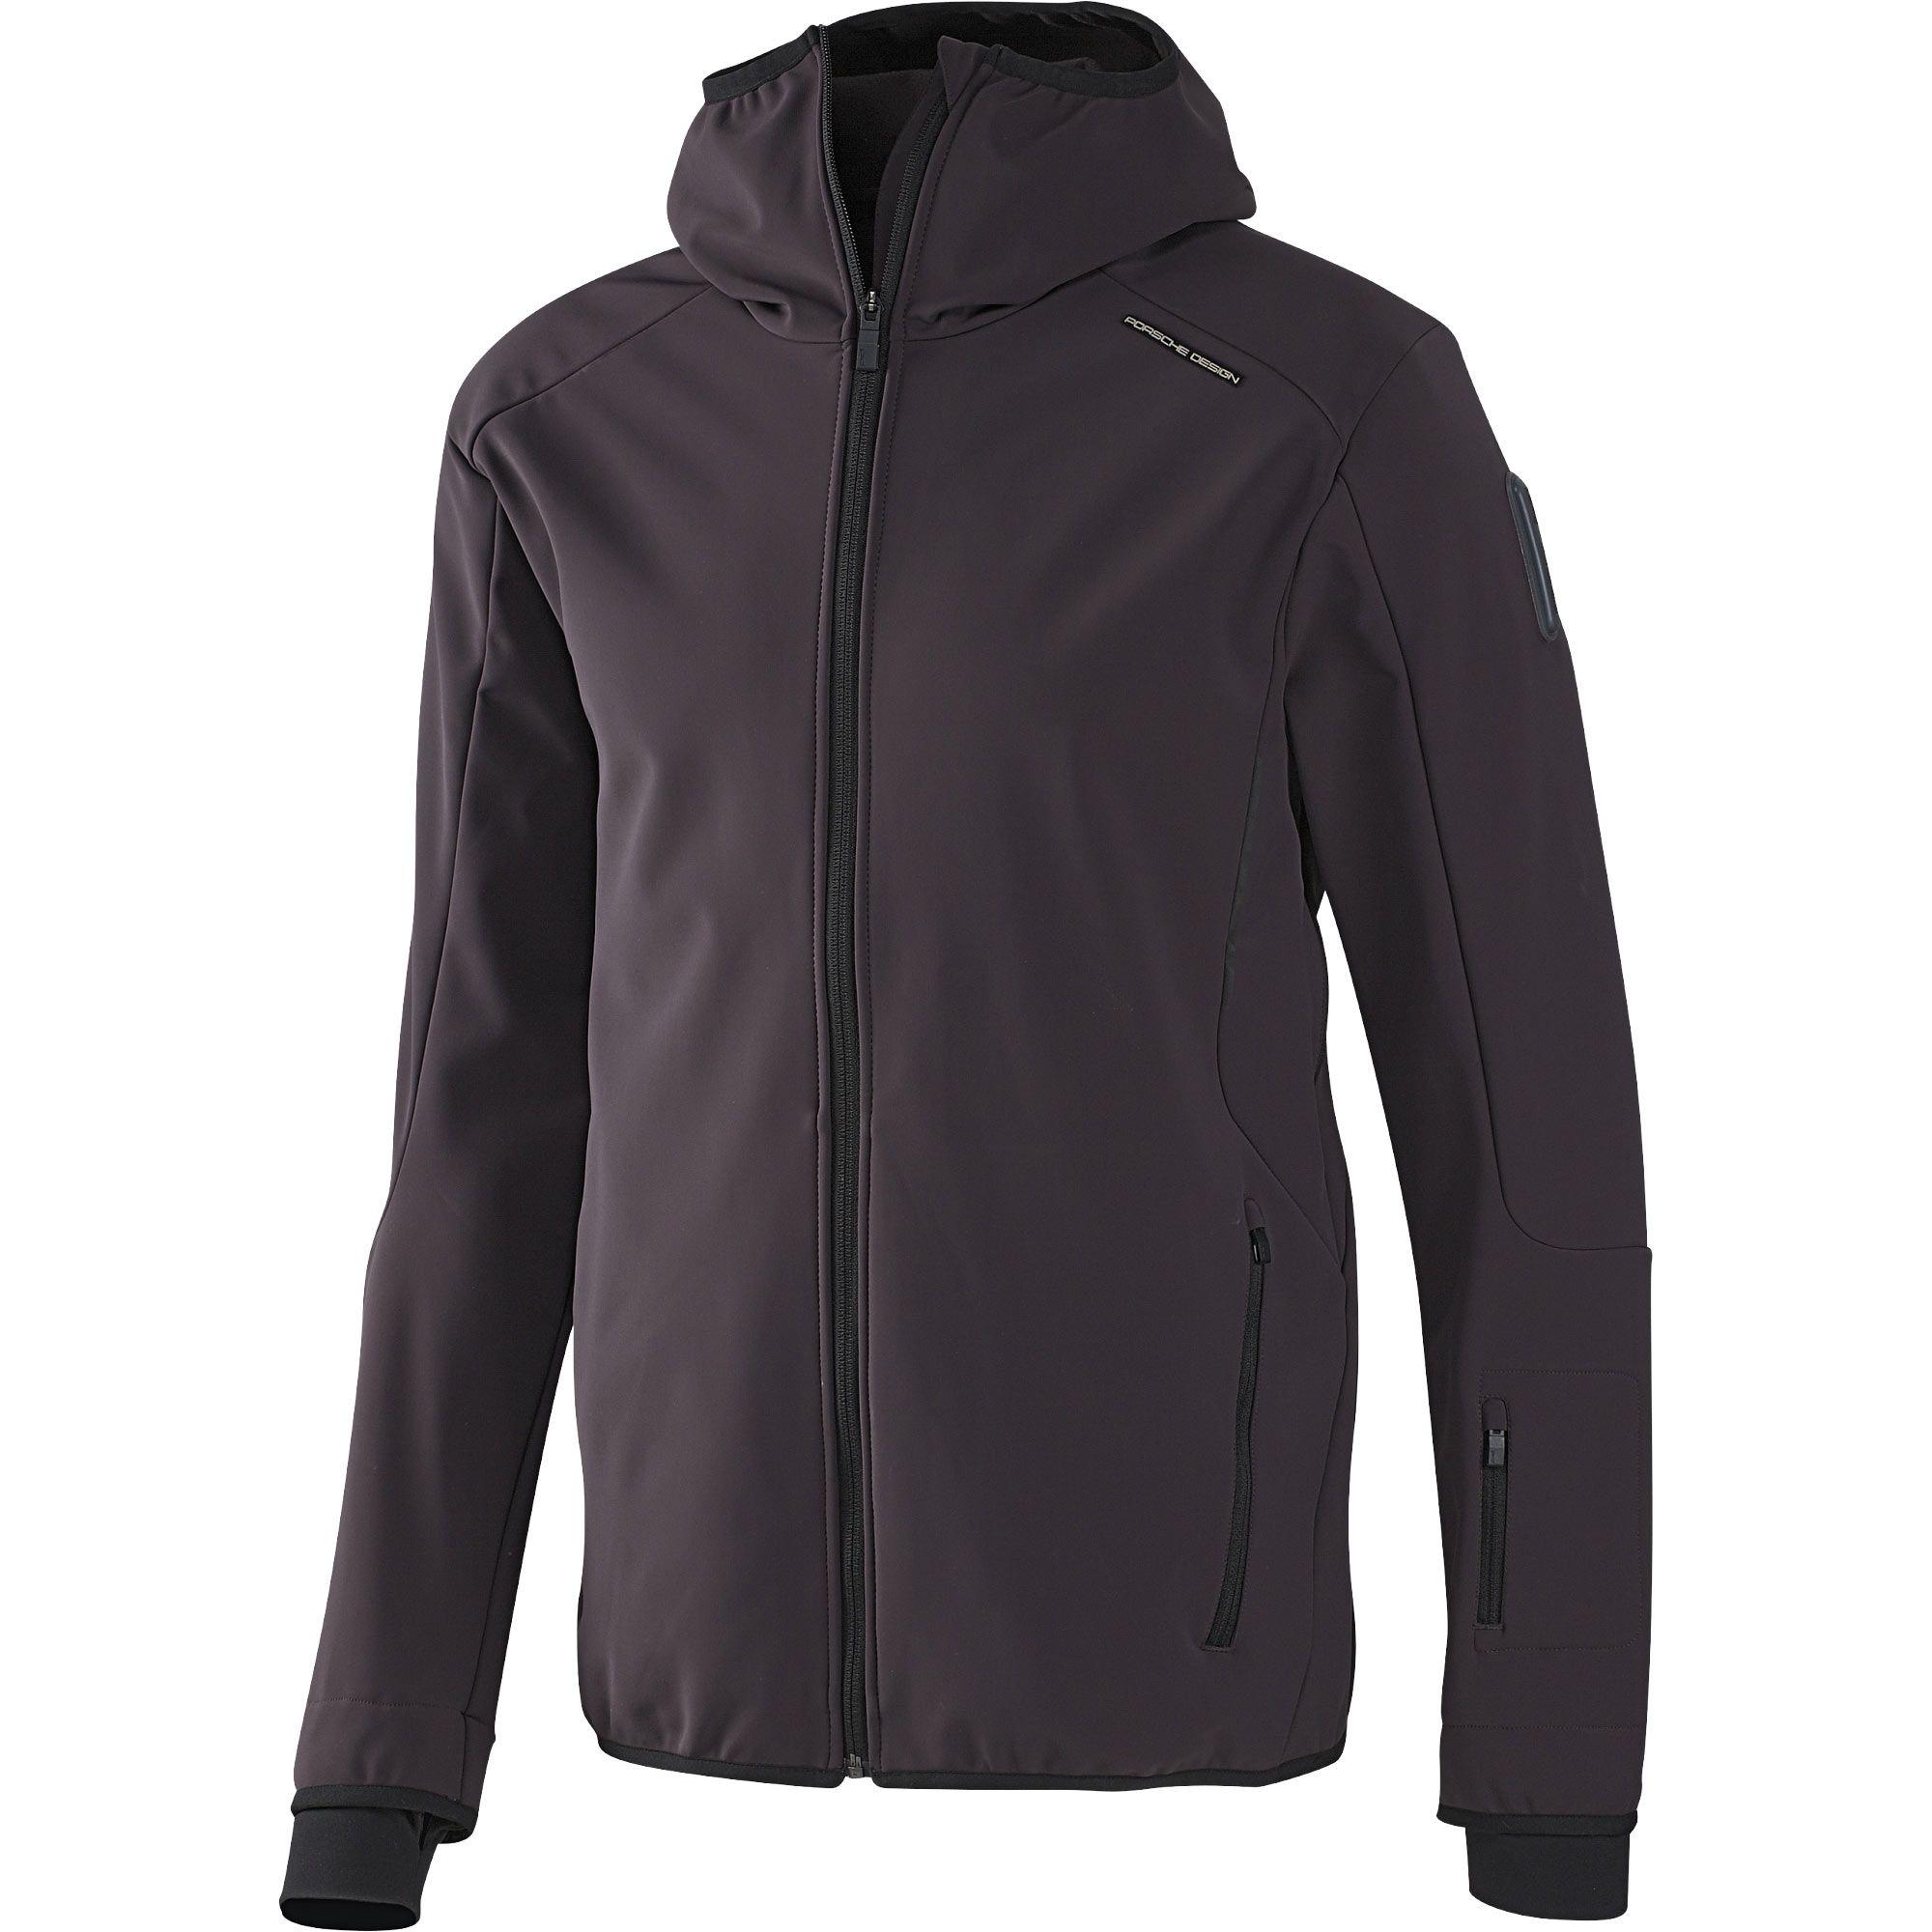 32+ Adidas mens softshell golf jacket information